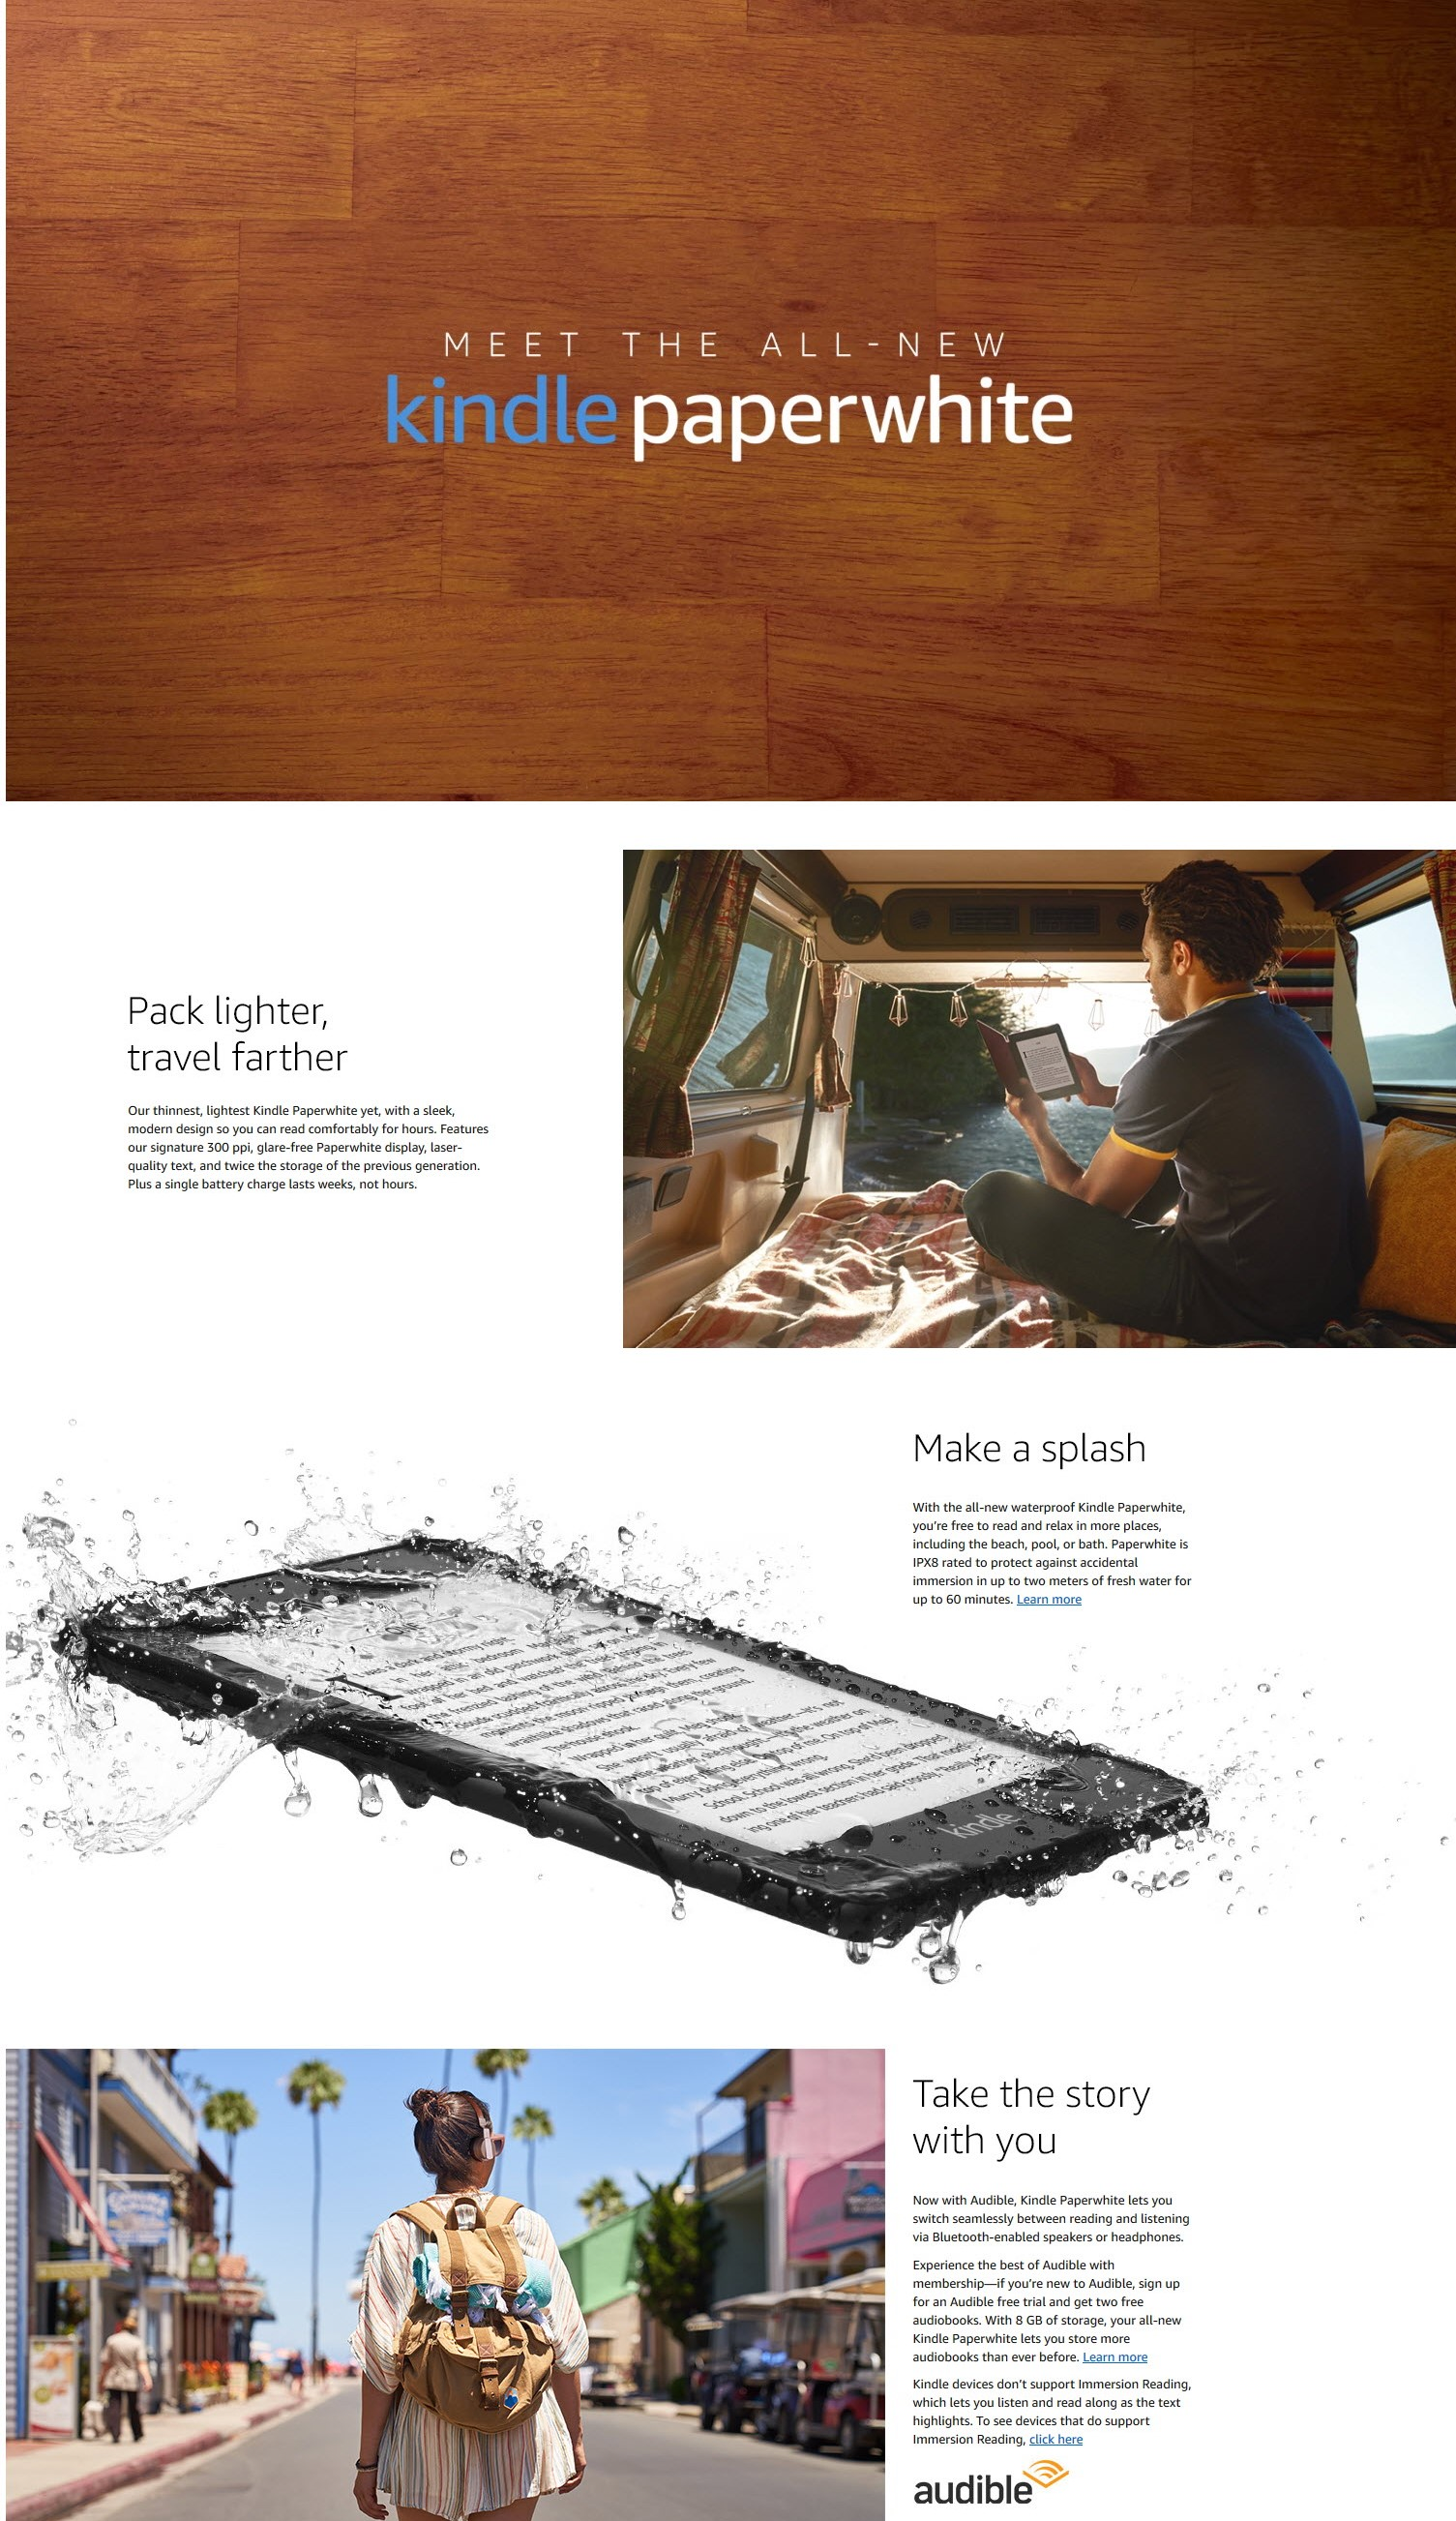 Amazon 2019 Kindle Paperwhite Waterproof 8/32GB + Screen Protector + Kindle  SG Setup Guide + Amazon Kindle Warranty